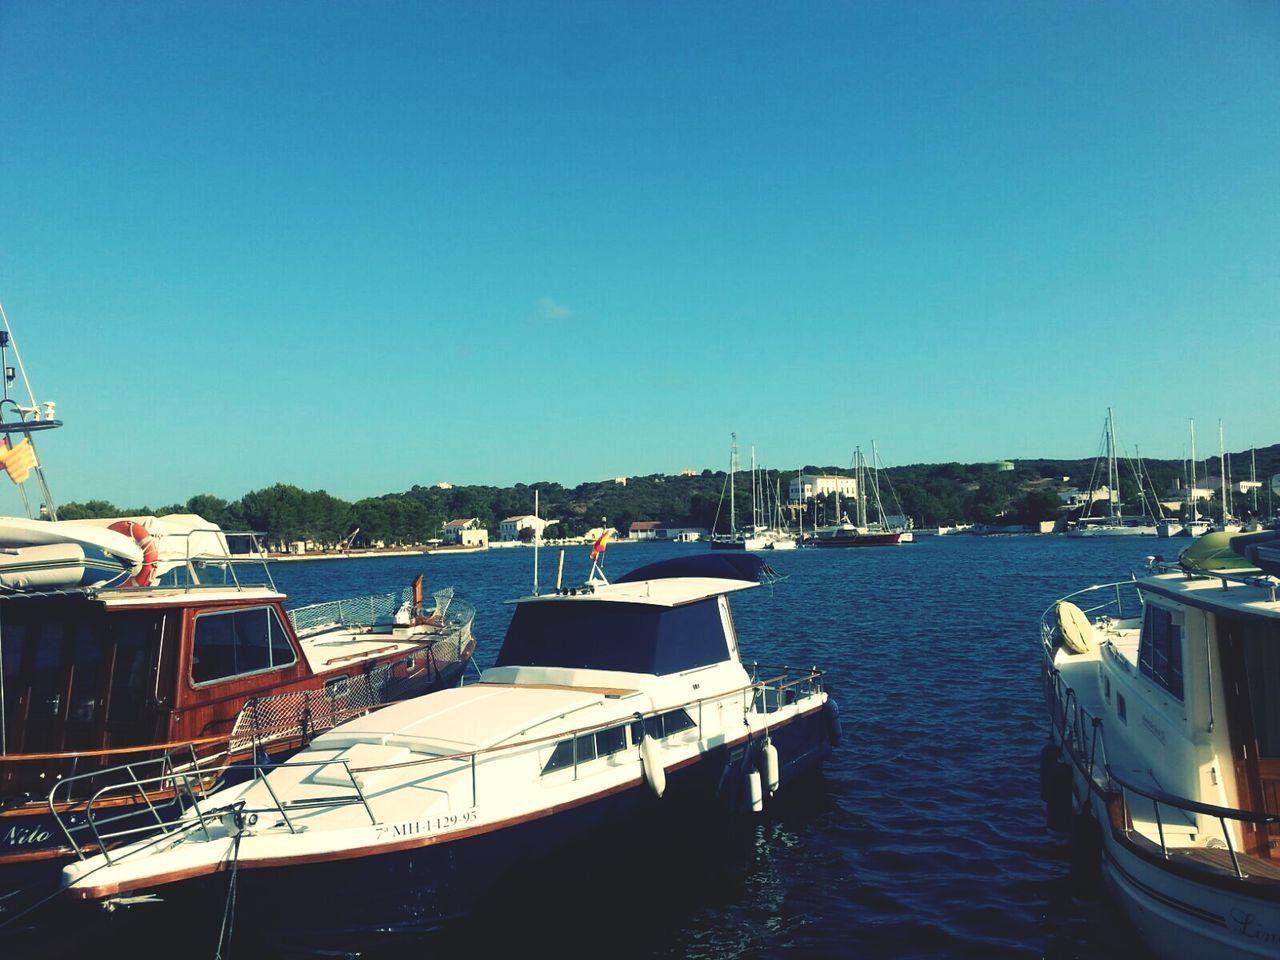 Showcase July Summer Ship Vintage SPAIN Menorca Port Sea Travel Destinations Balearicislands Mao Tourism